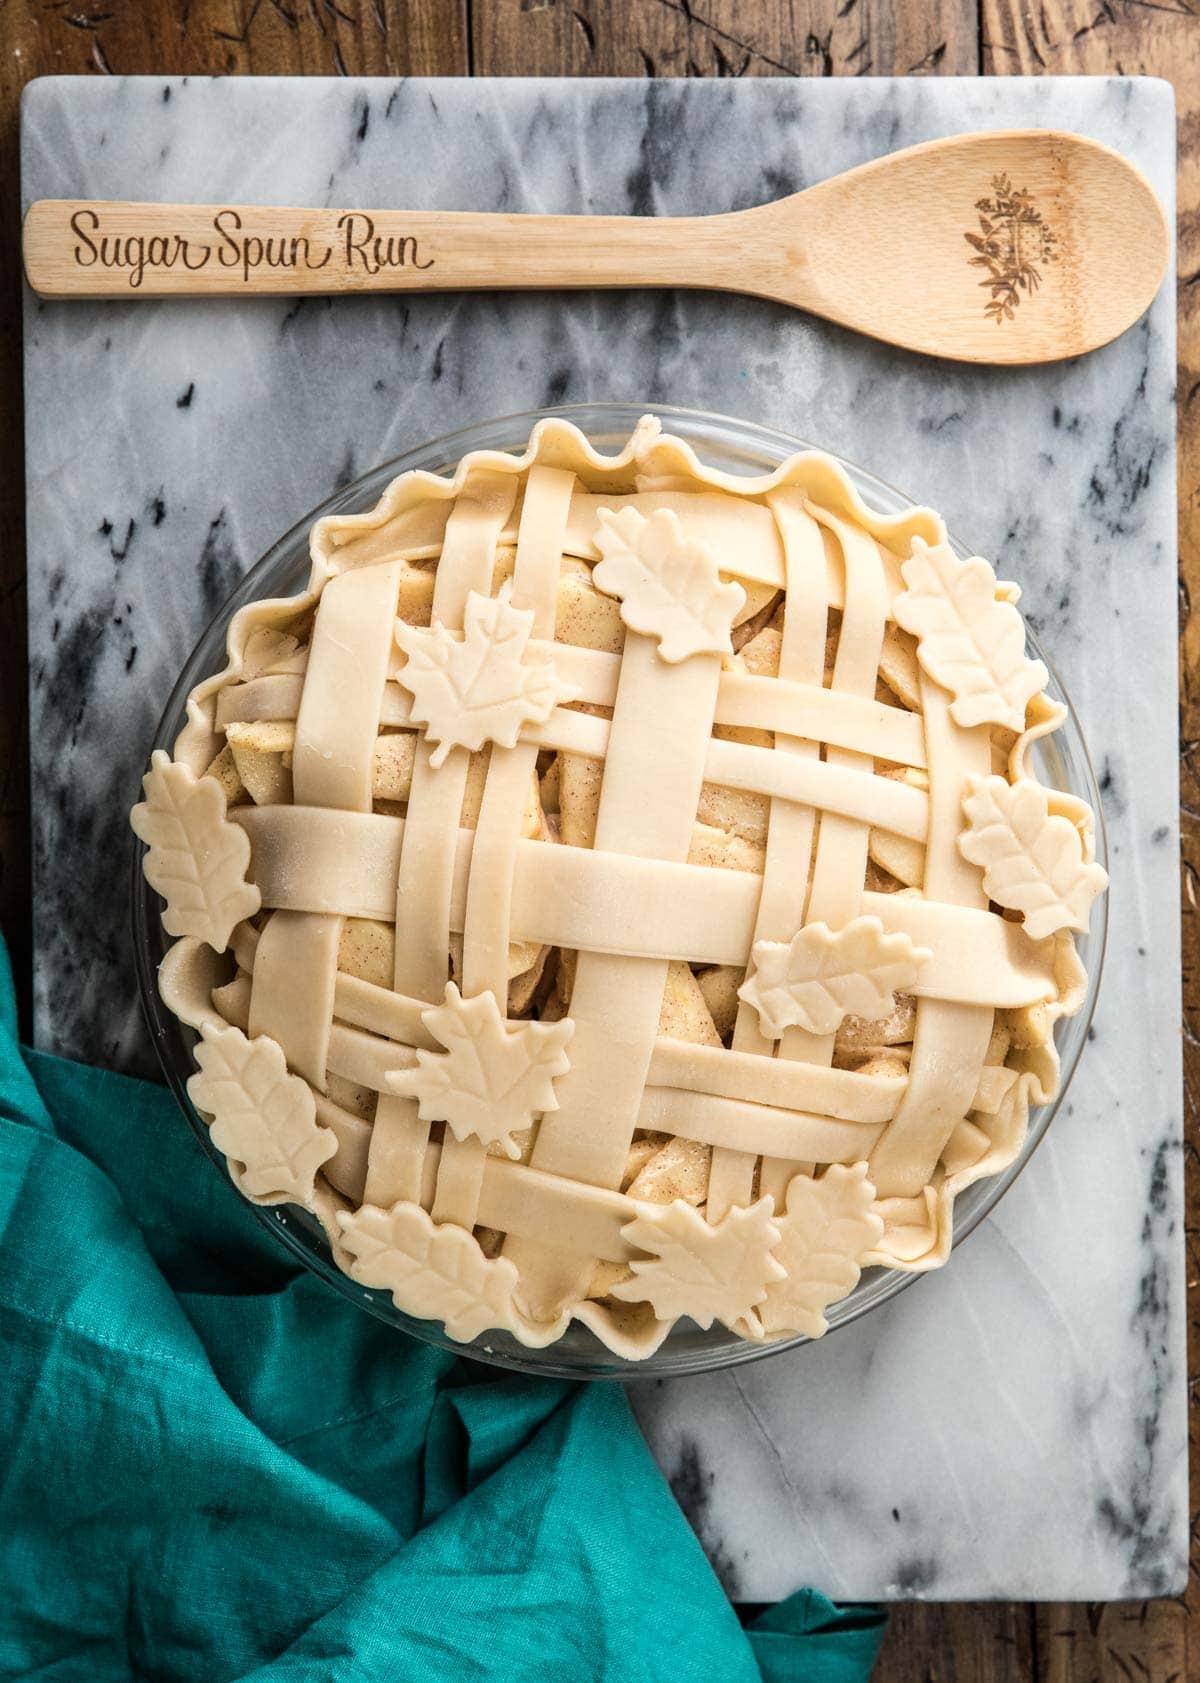 intricate lattice pie crust